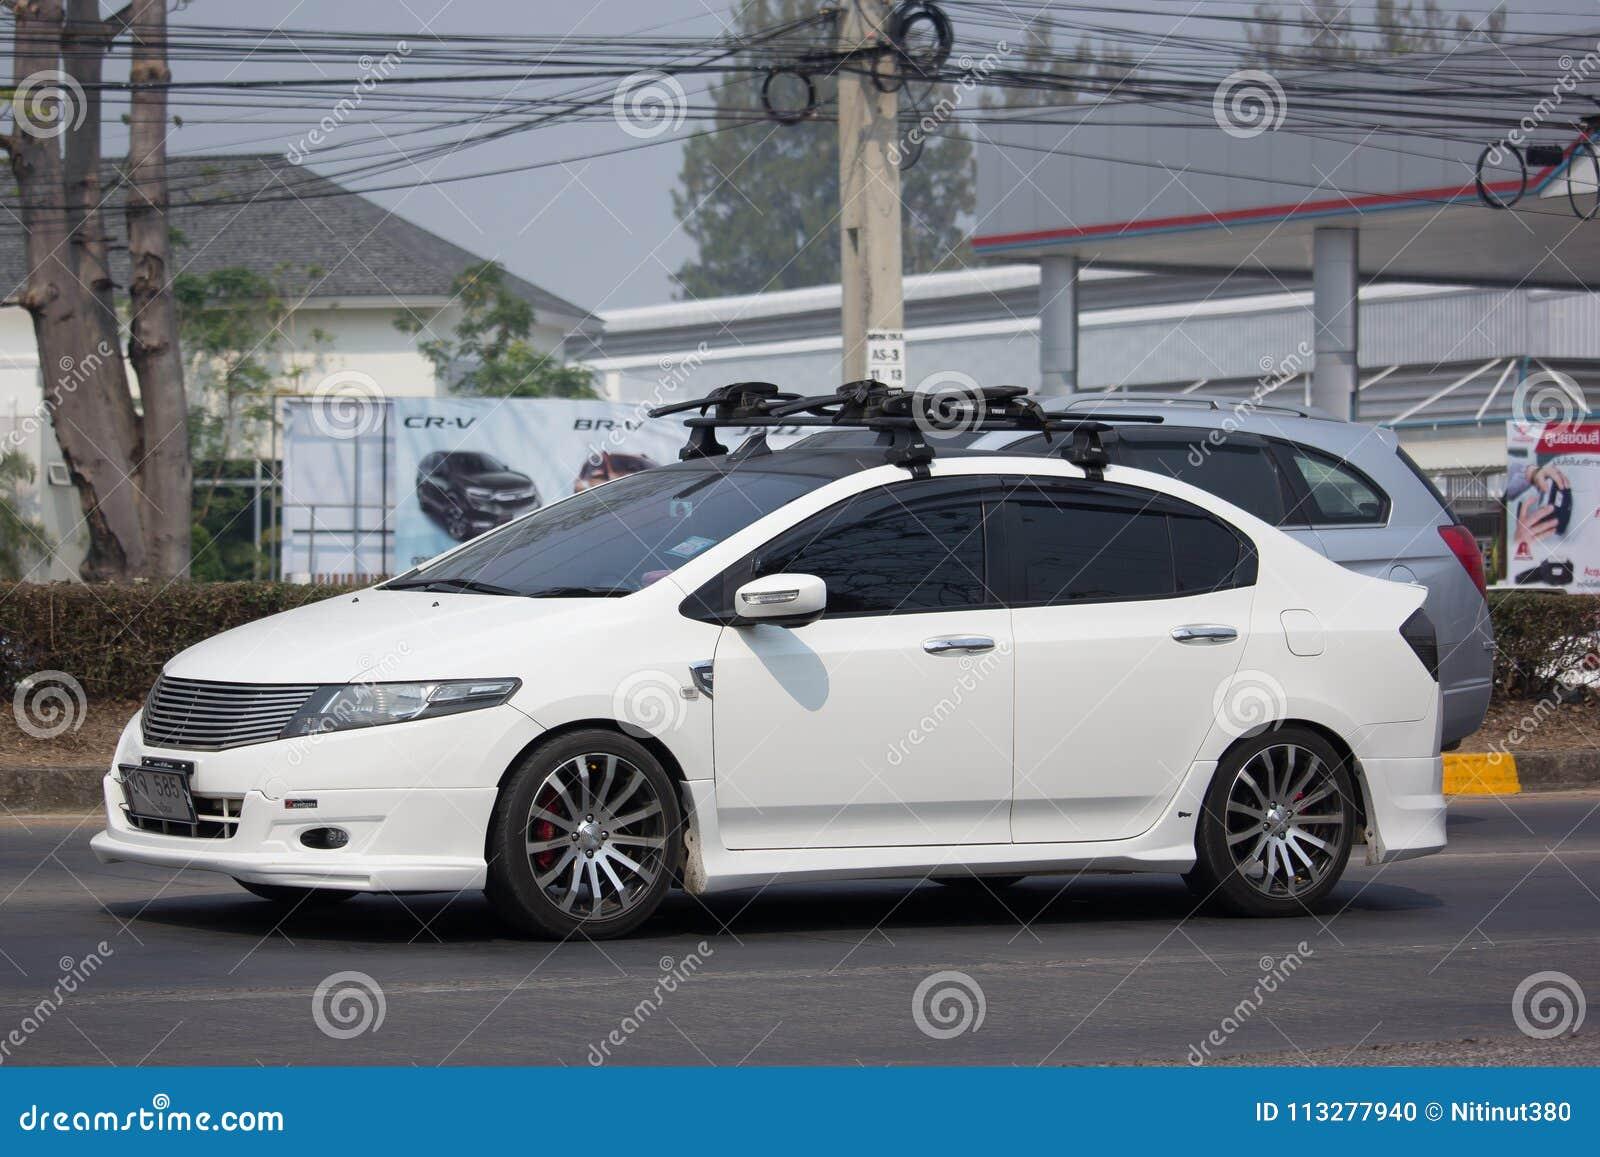 Private City Car Honda City Editorial Image Image Of Wheel Asian